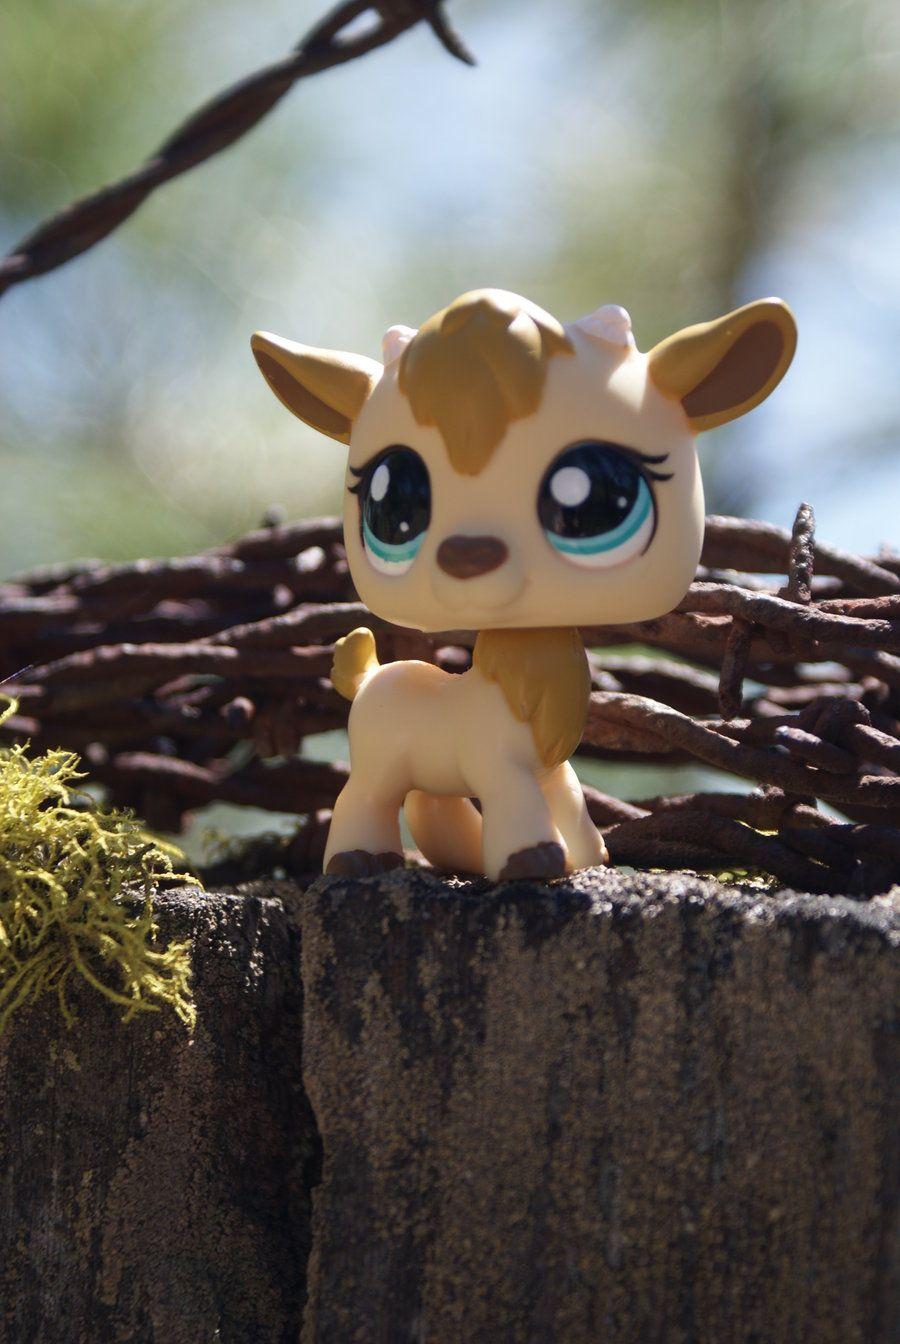 LPS goat by Eli102.deviantart.com on @deviantART | Pets ...